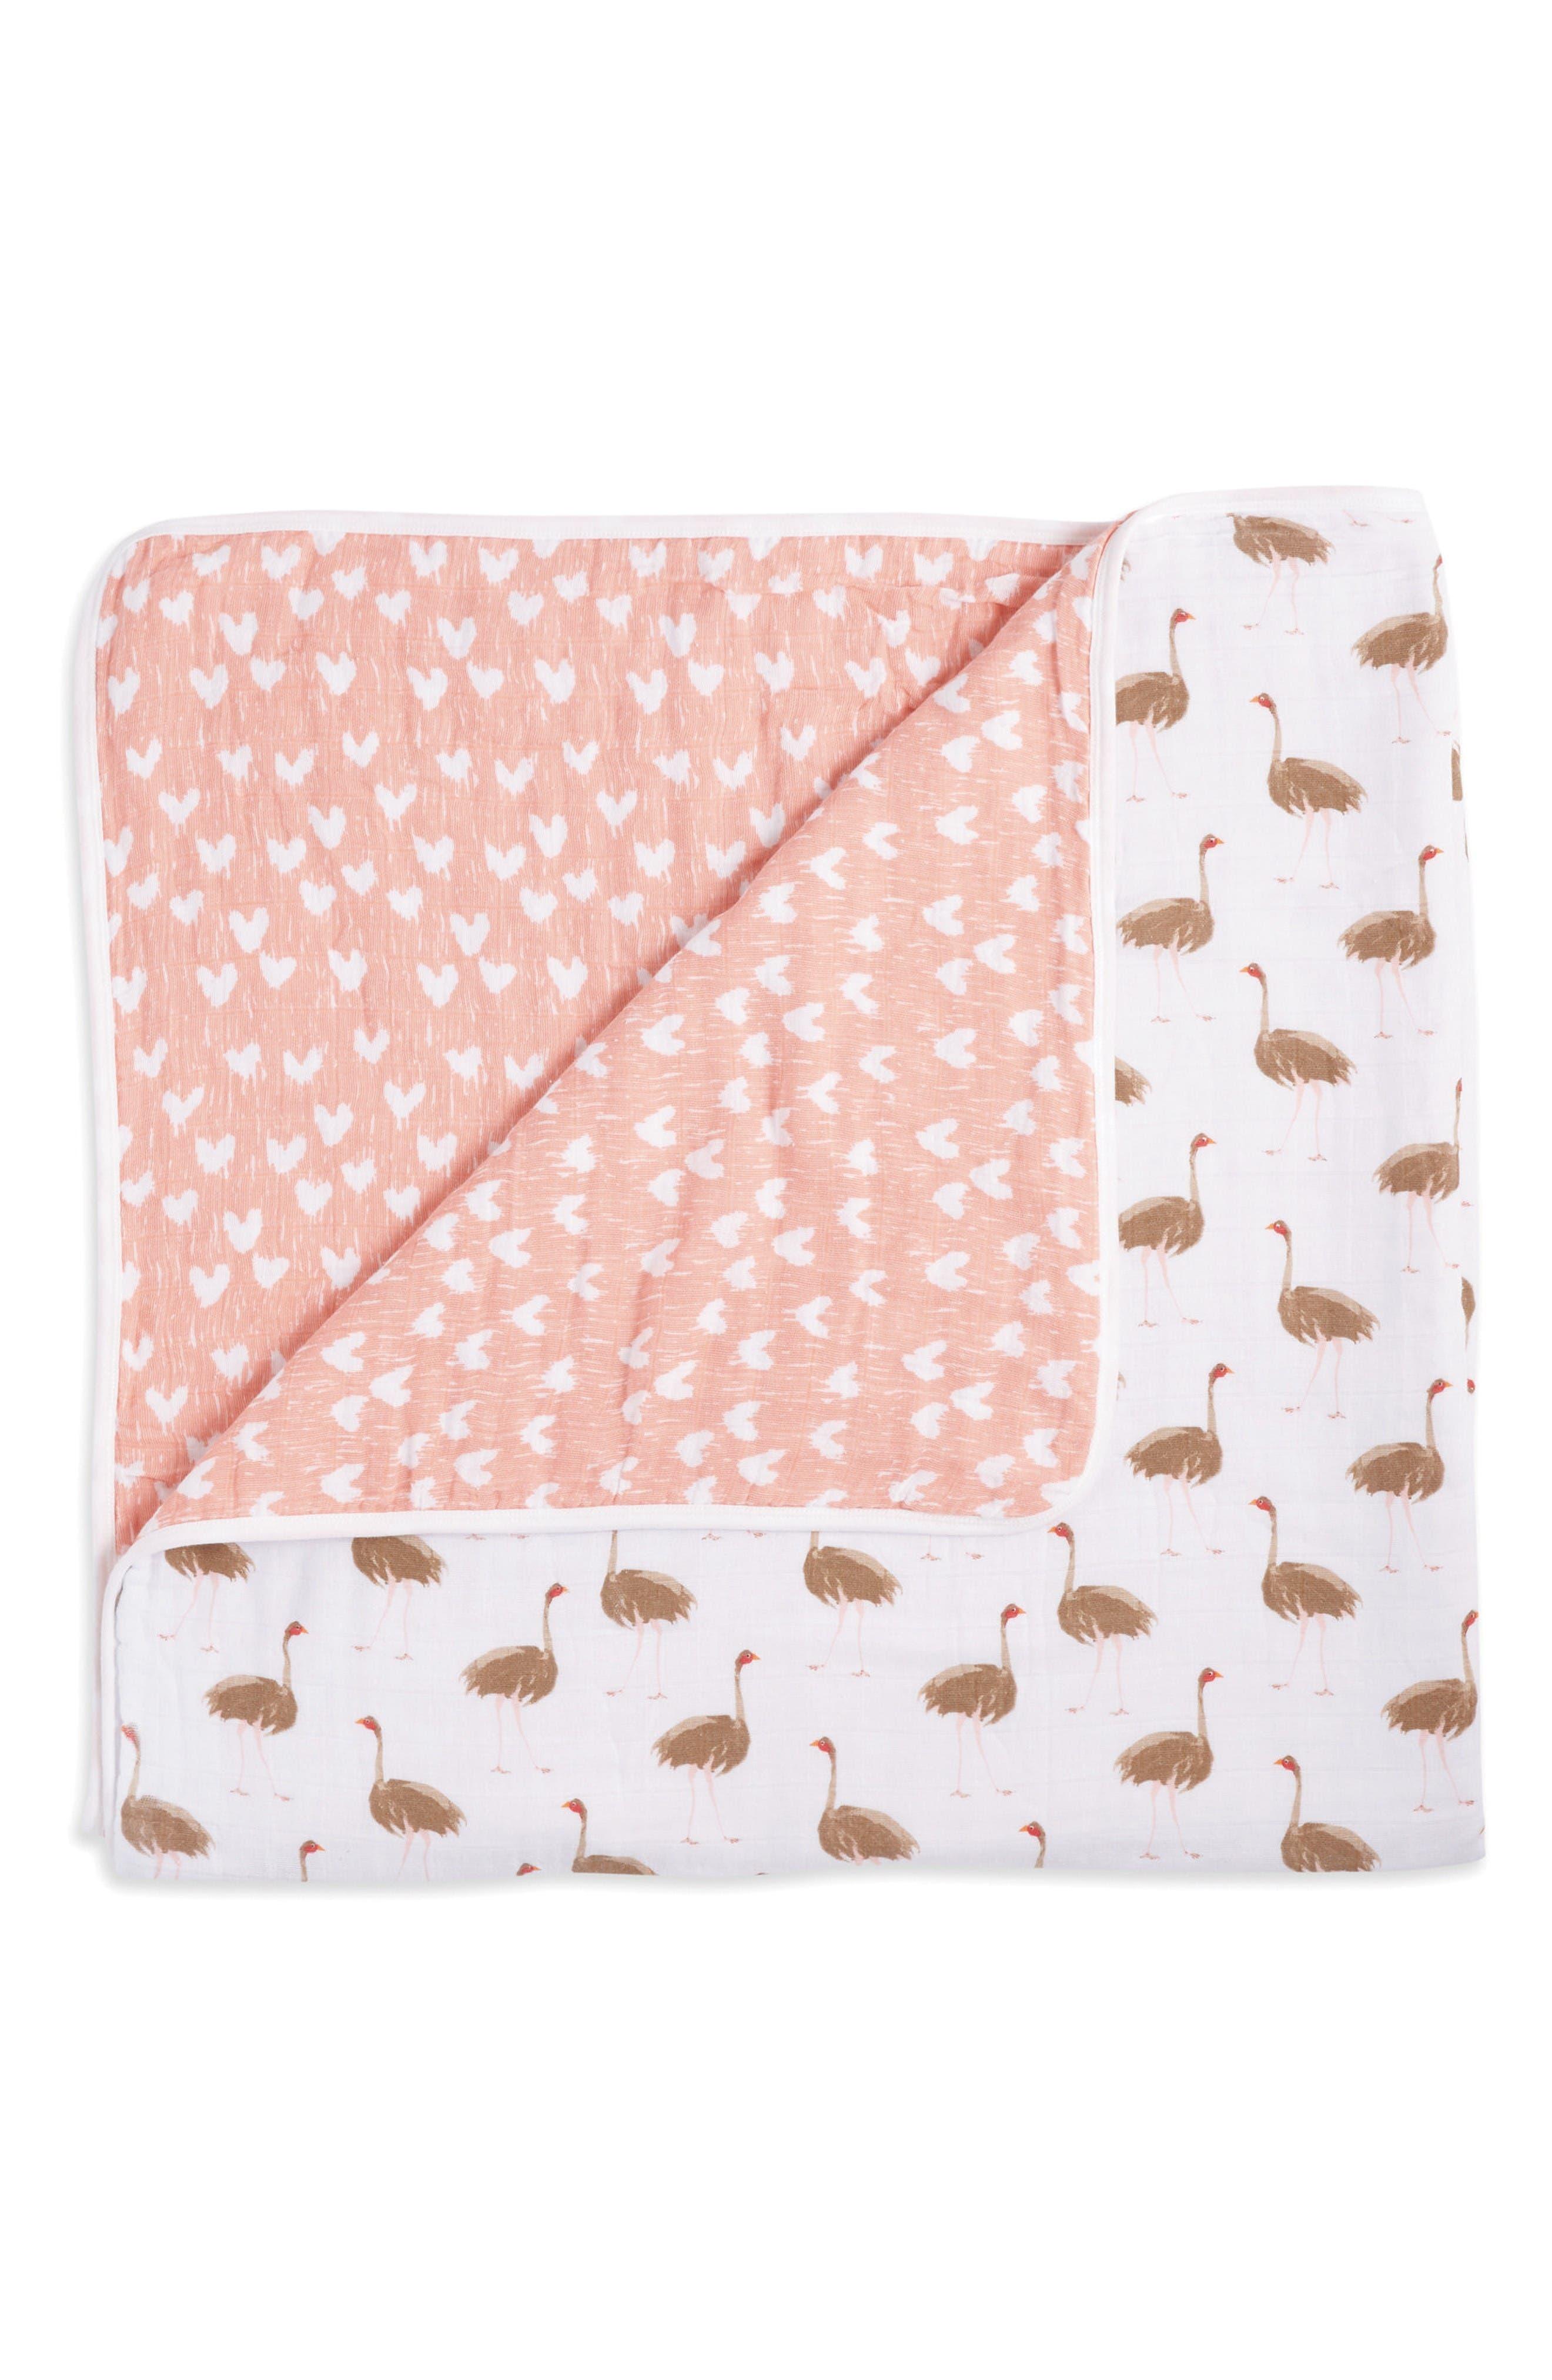 Main Image - aden + anais Dream Blanket™